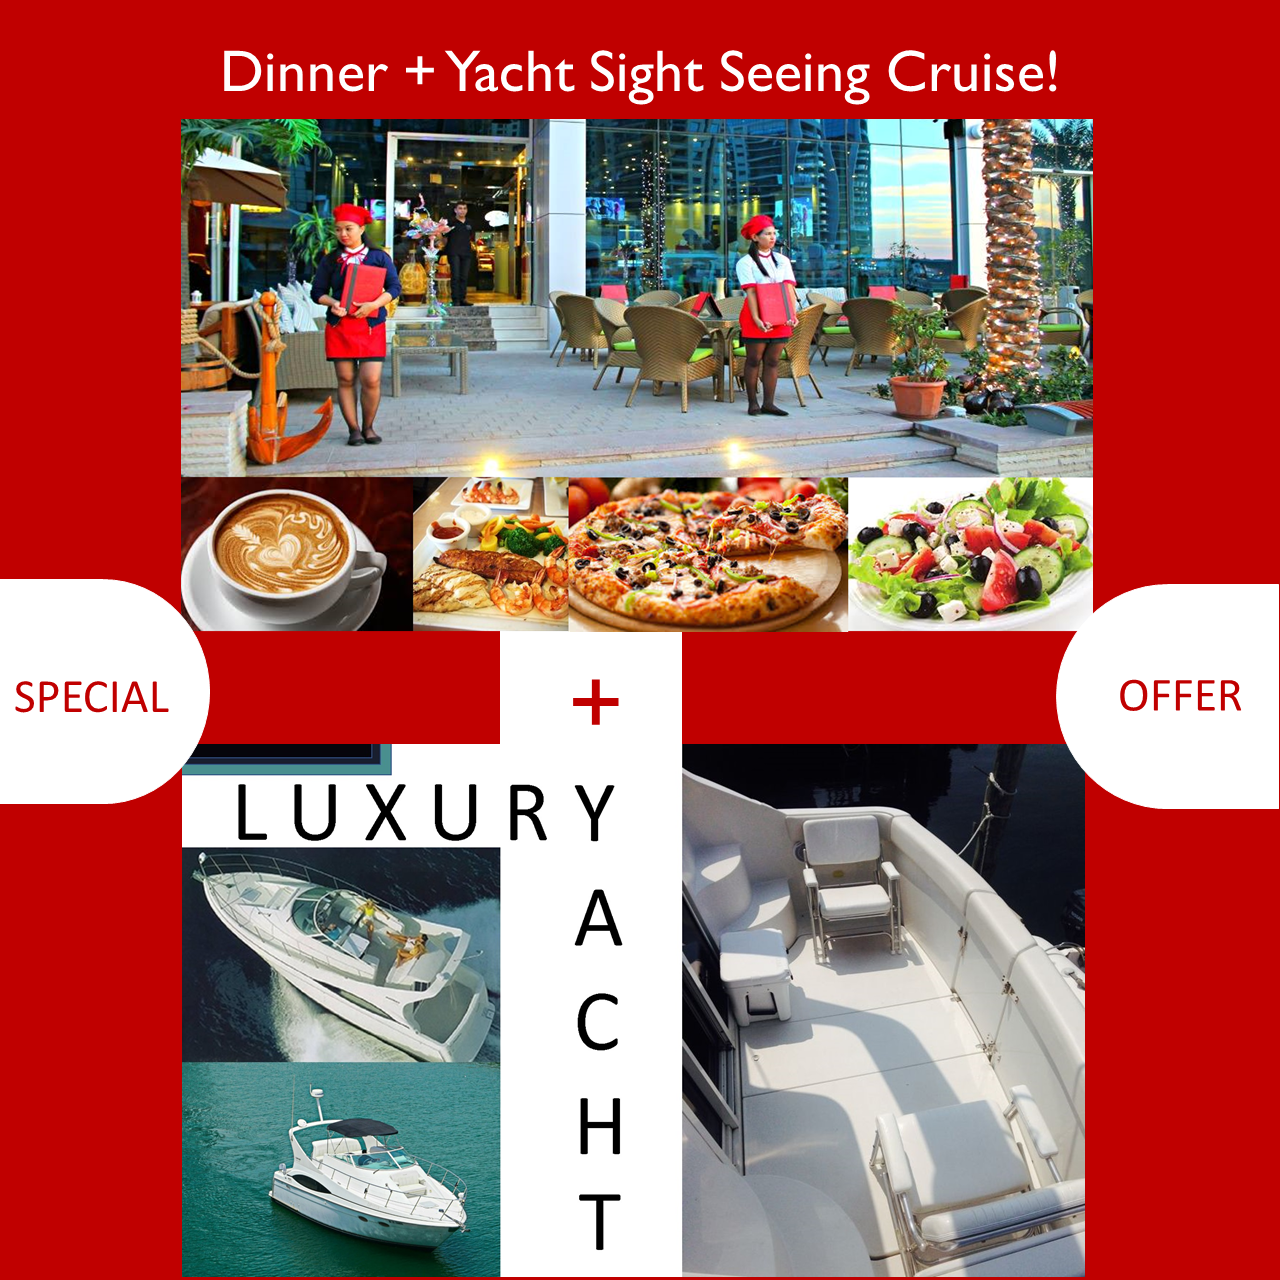 Luxury Yacht Sight Seeing Tour + Dinner